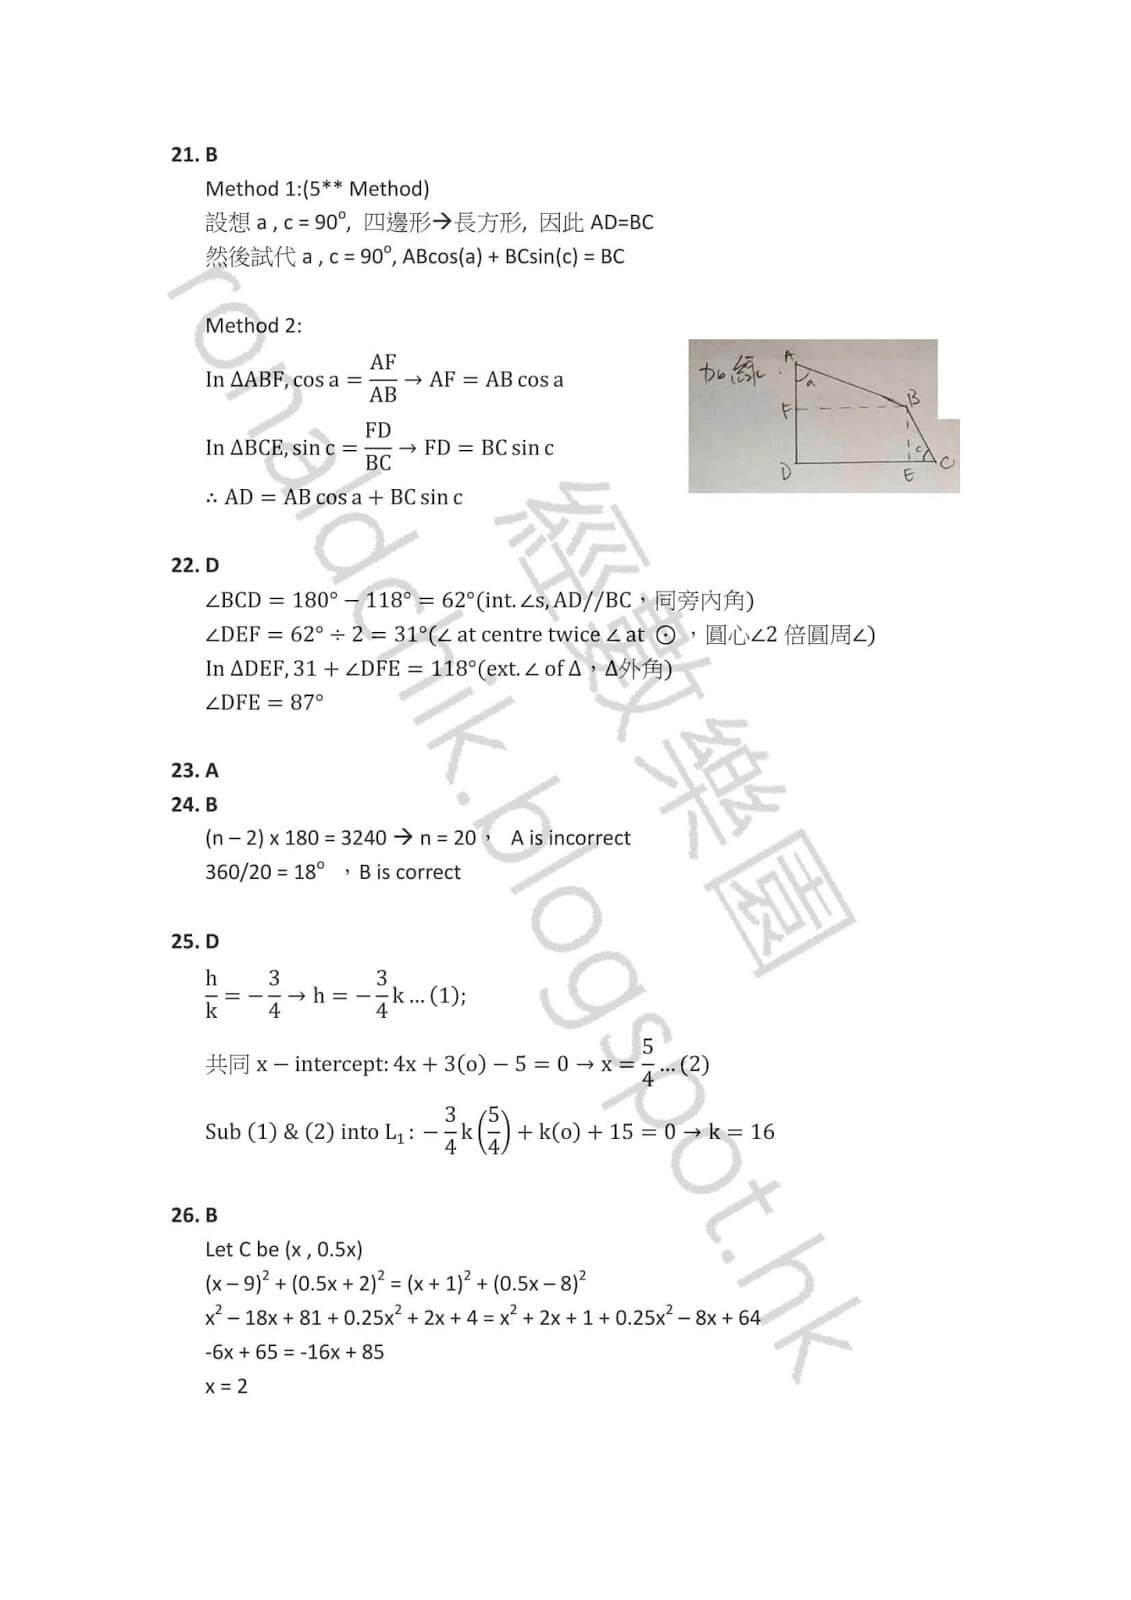 2016 DSE 數學卷二 mc Math Paper 2 詳細答案連解釋 Part 2 (Q.21-45) - 經數樂園-學習變有趣~ |||[補習(小組|私人)]